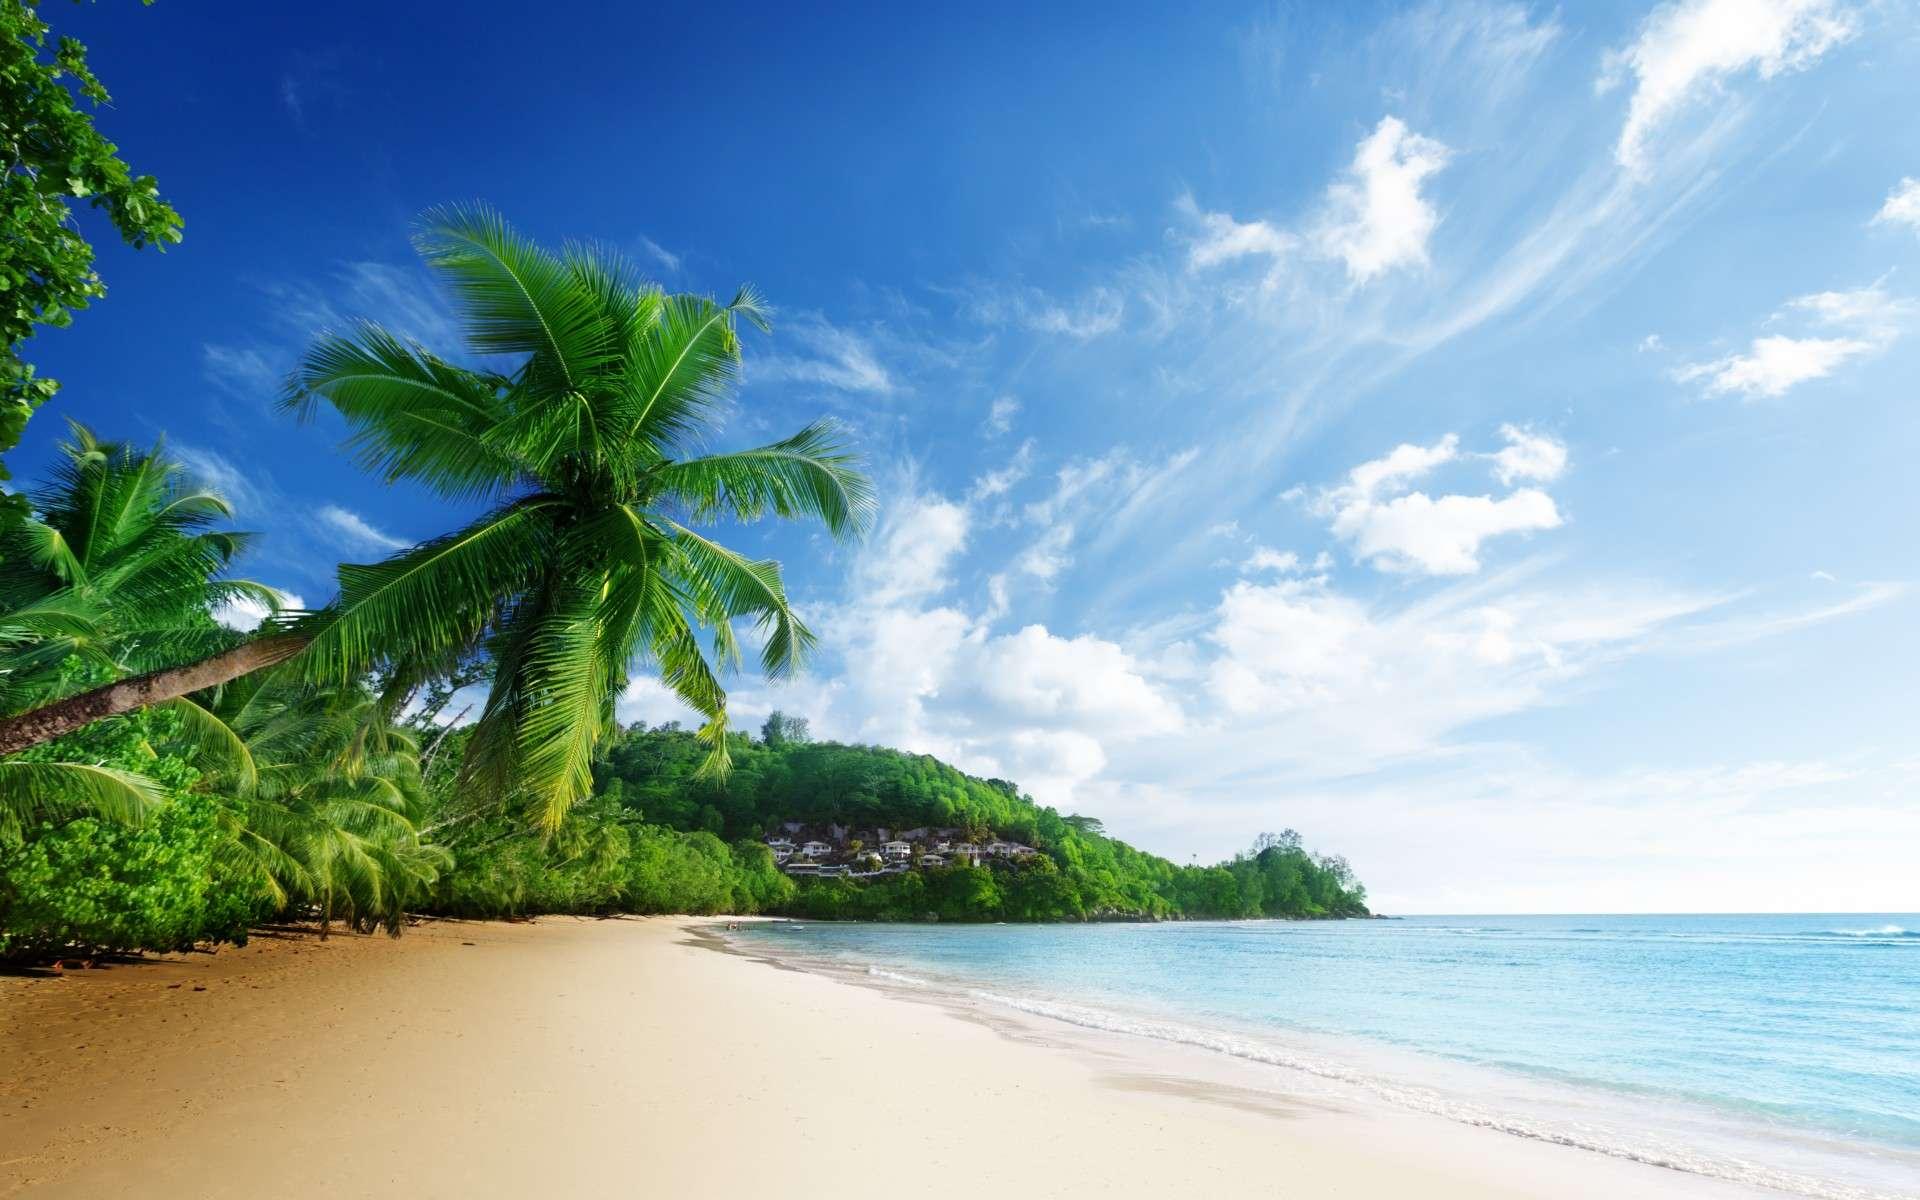 Beach Scenery HD Wallpapers